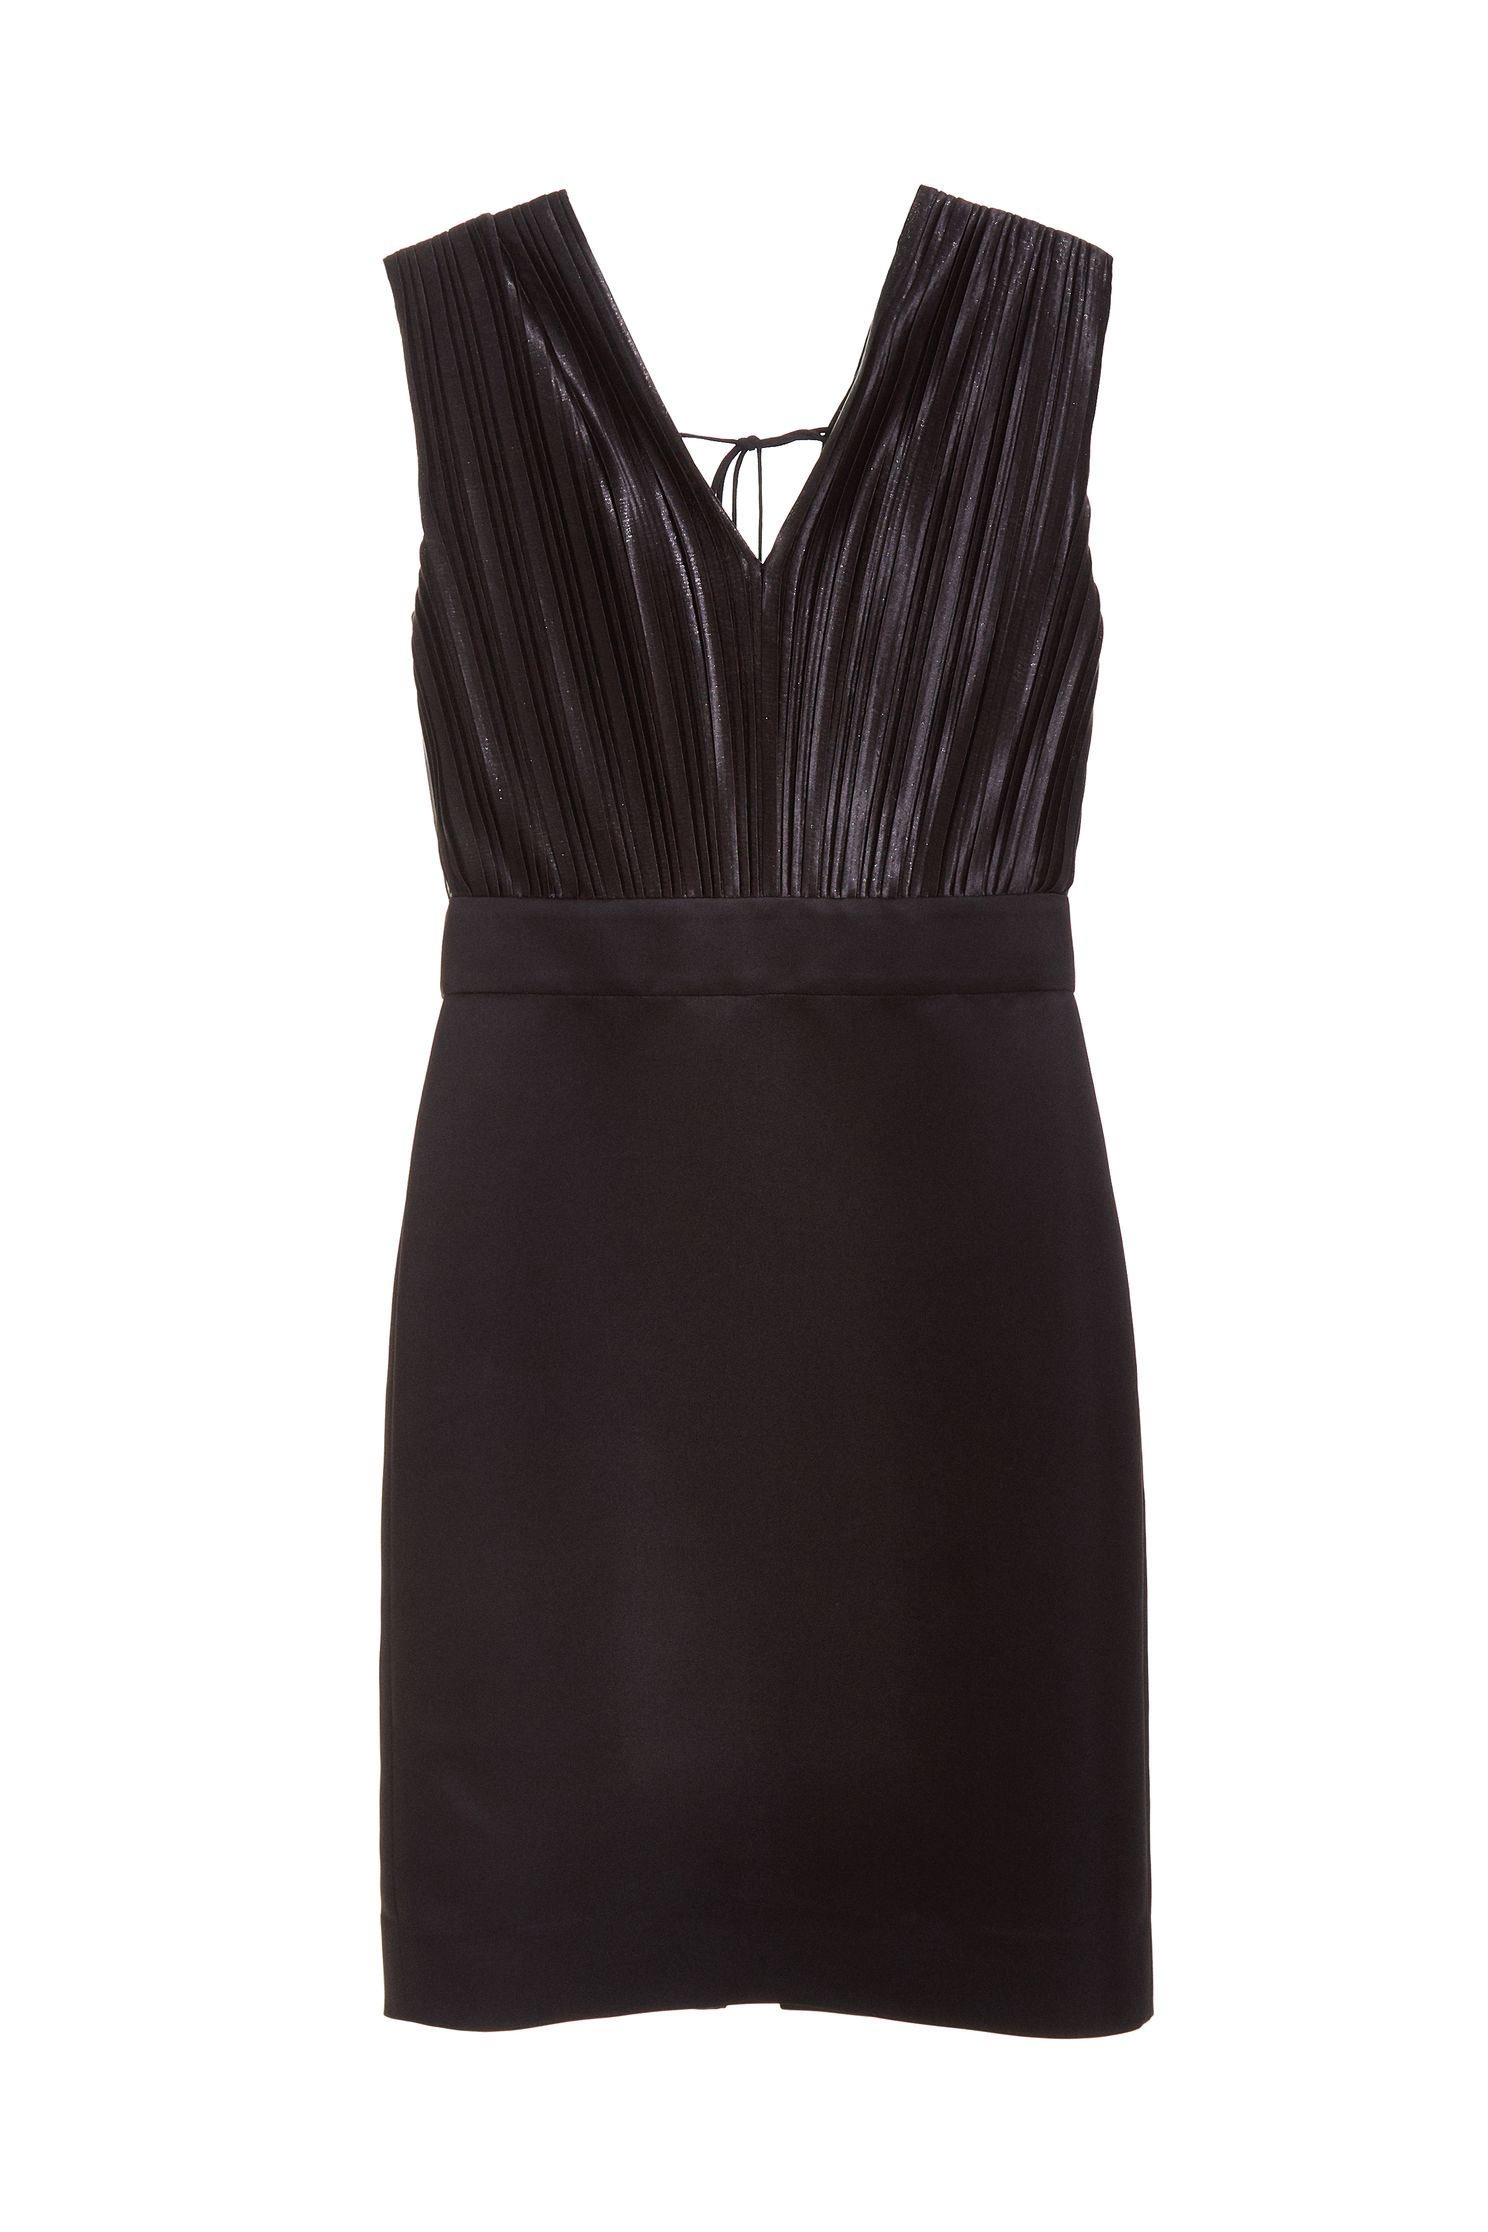 Elegant and slim fashion dress,V-neck dress,小禮服,無袖洋裝,Black dress